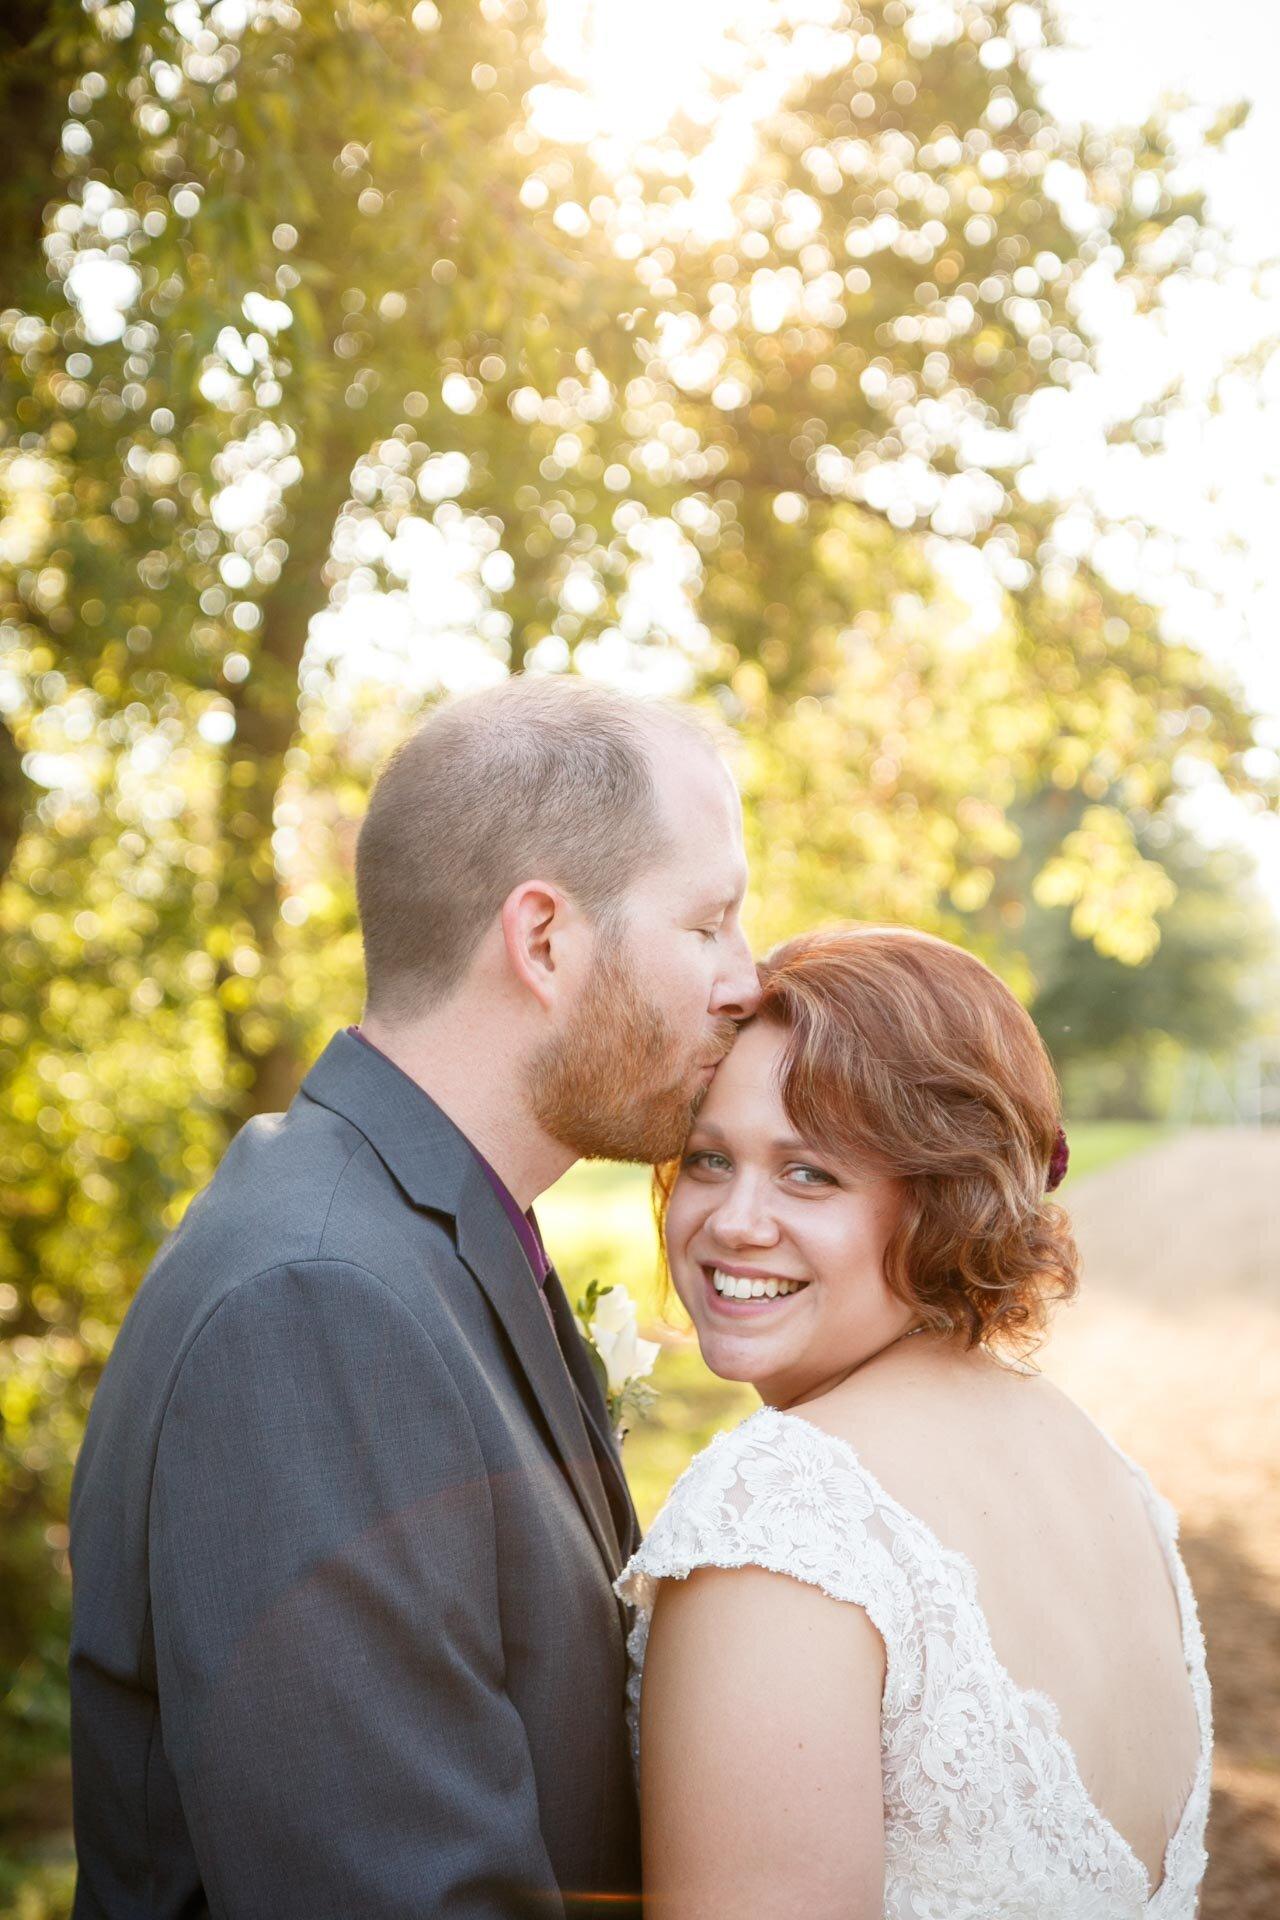 fall-lighting-adam-shea-photography-wedding-engagement-blog-adam-shea-photography-green-bay-appleton-neenah-photographer-08.jpg